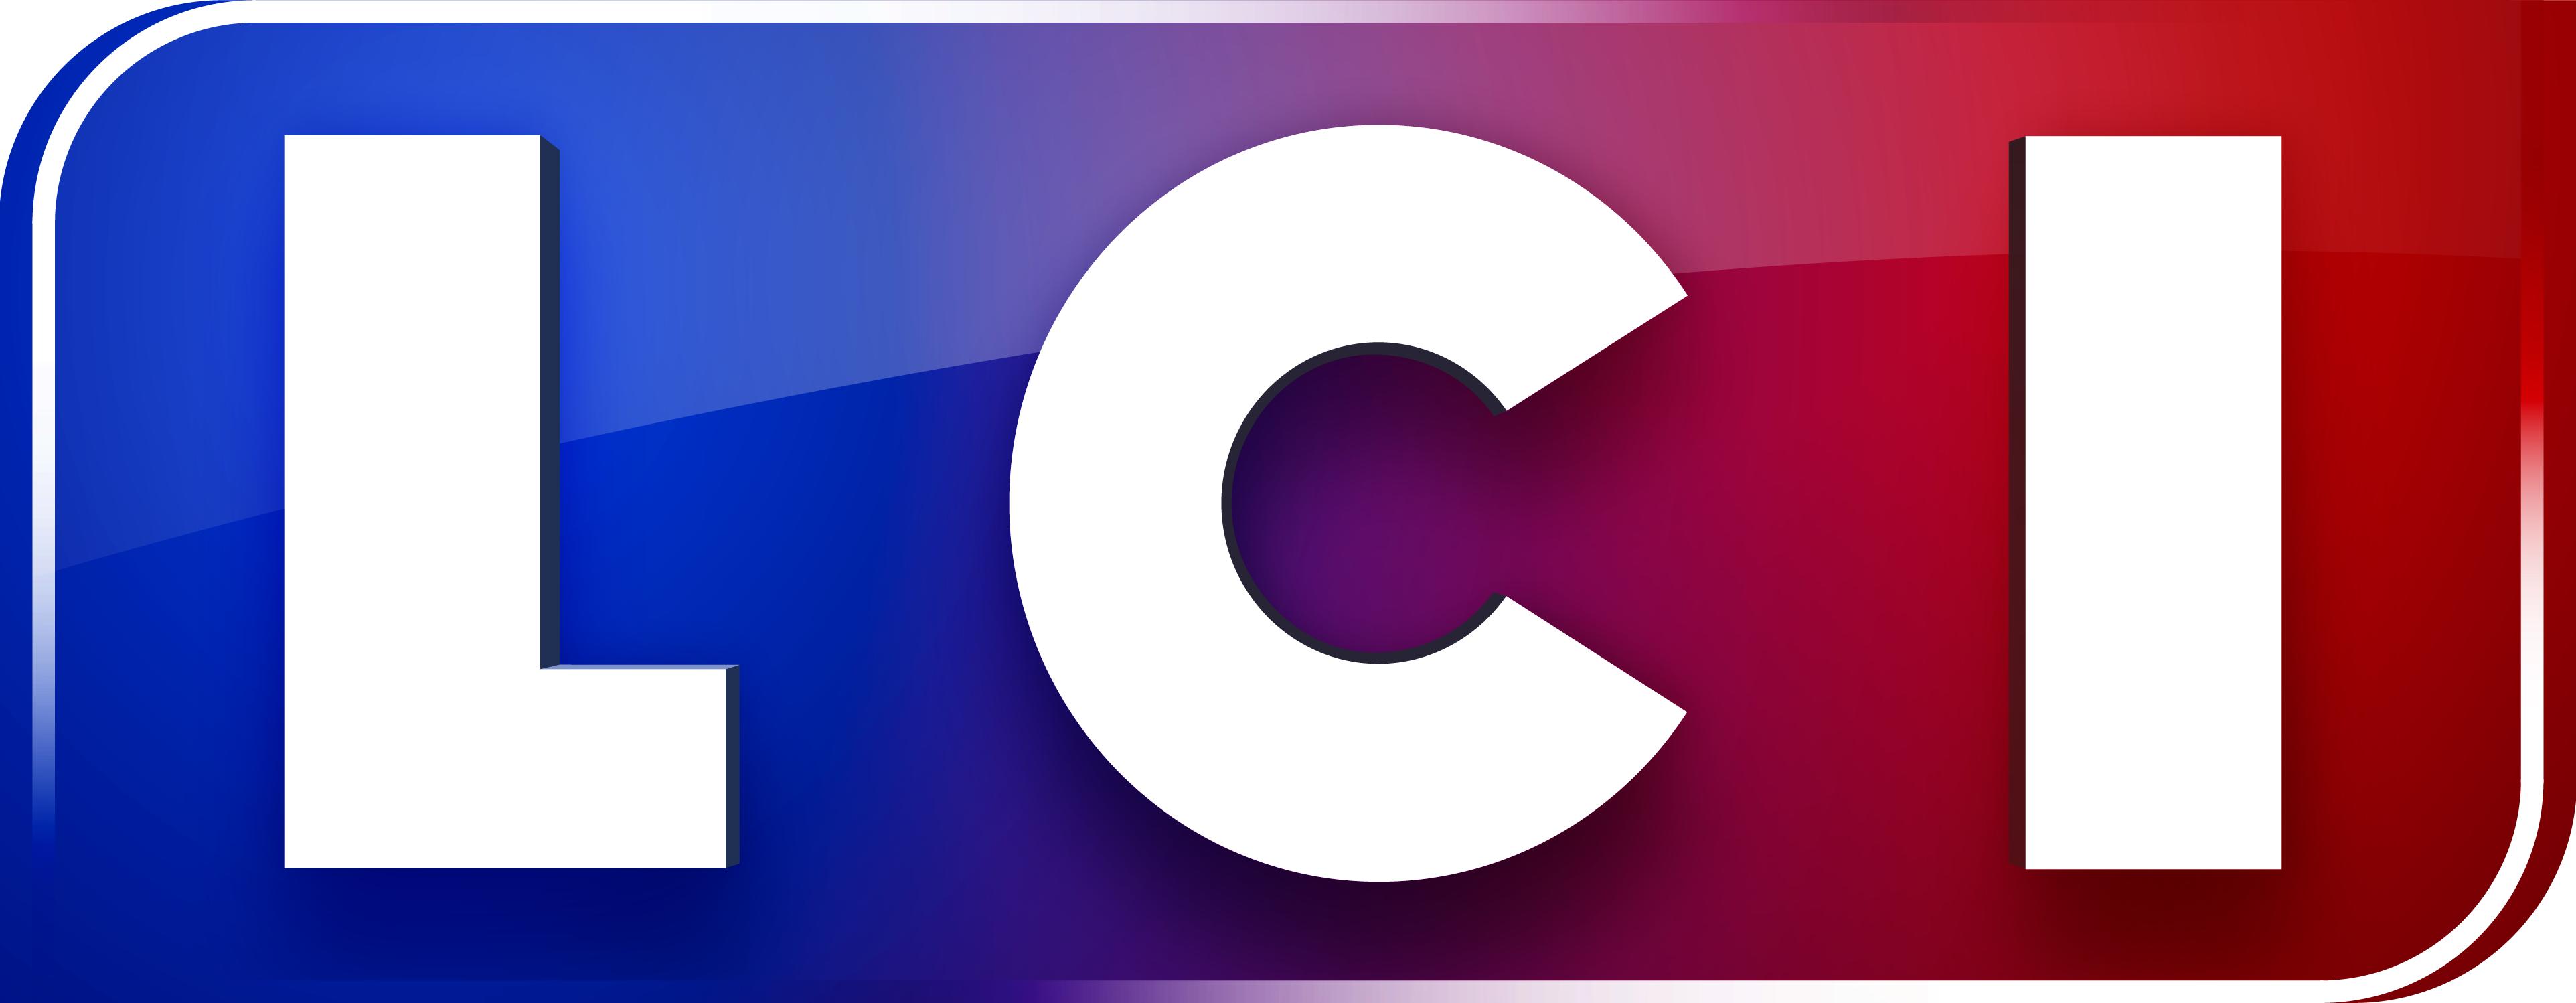 LCI_logo_(2016)